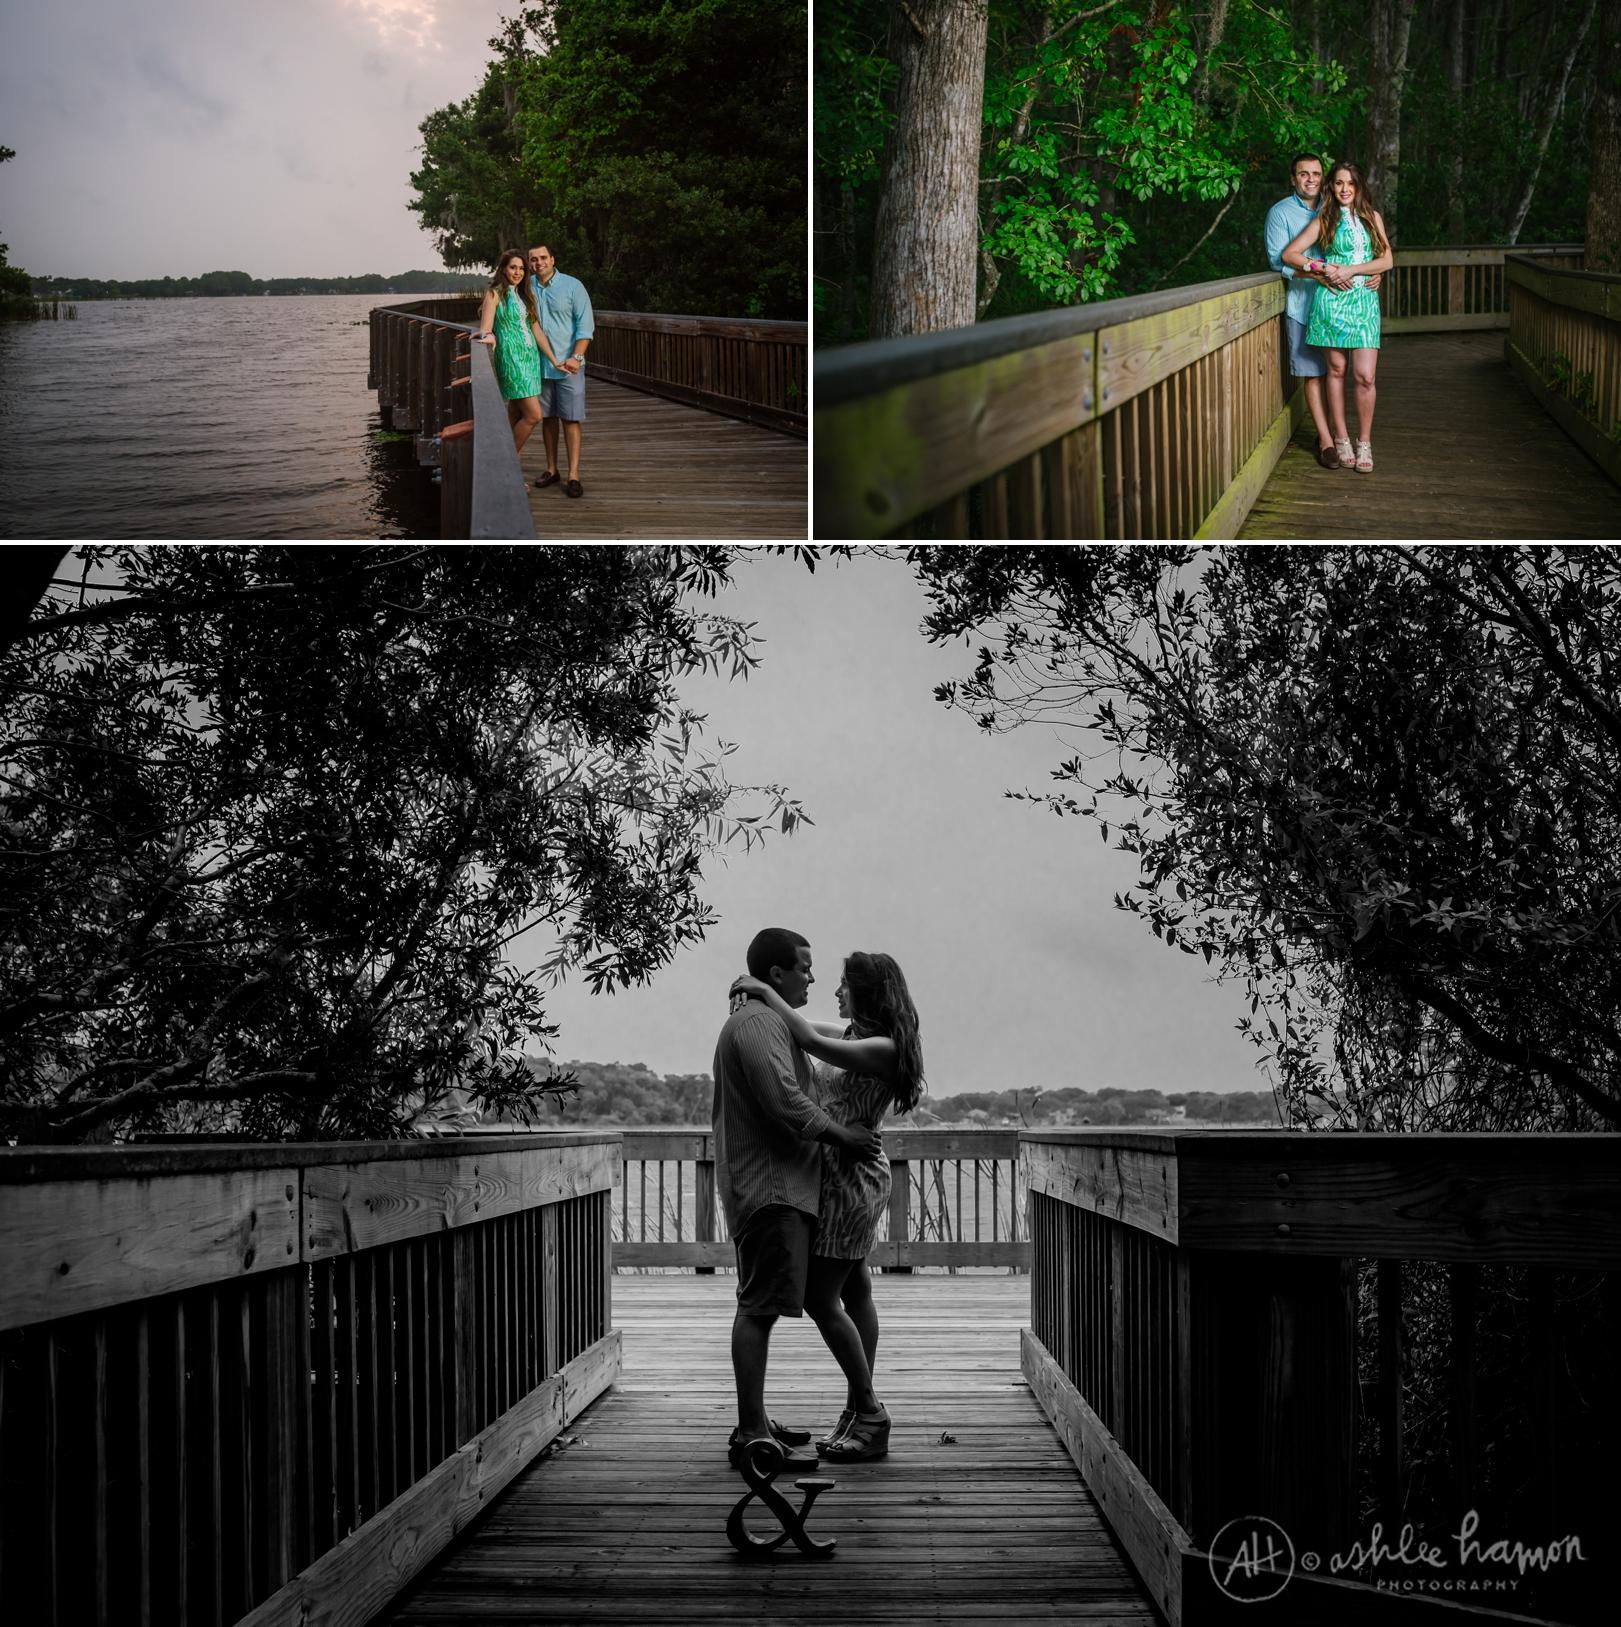 ashlee-hamon-photography-tampa-springs-outdoor-engagement_0008.jpg